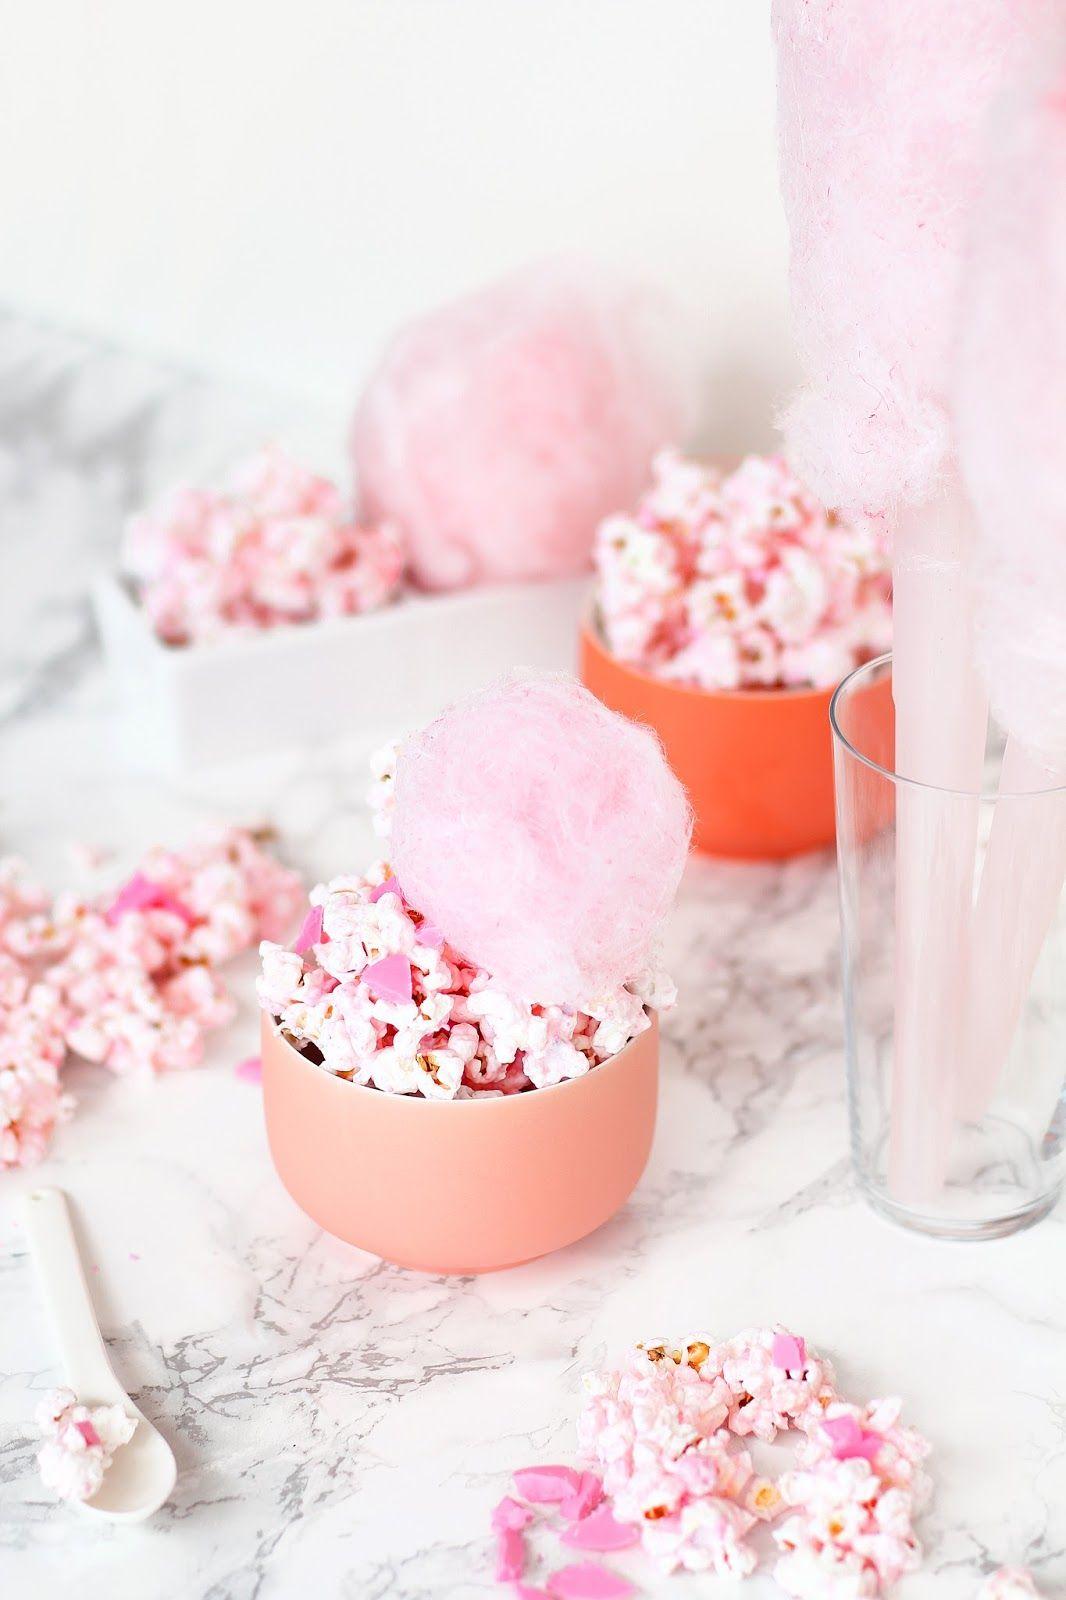 Cotton Candy Popcorn Candy popcorn, Cotton candy recipe